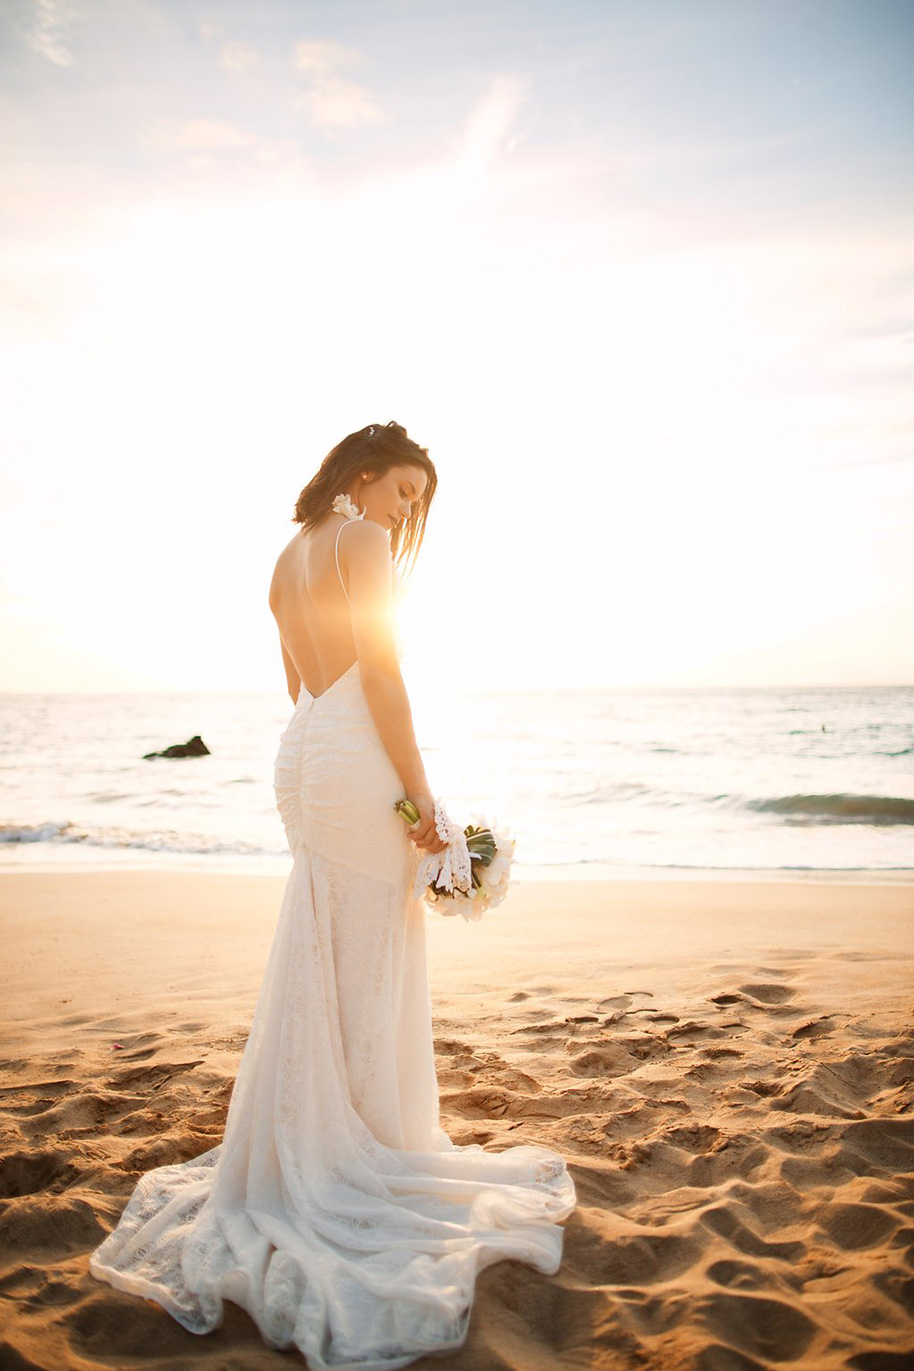 Maui-Beach-Wedding-070616-21